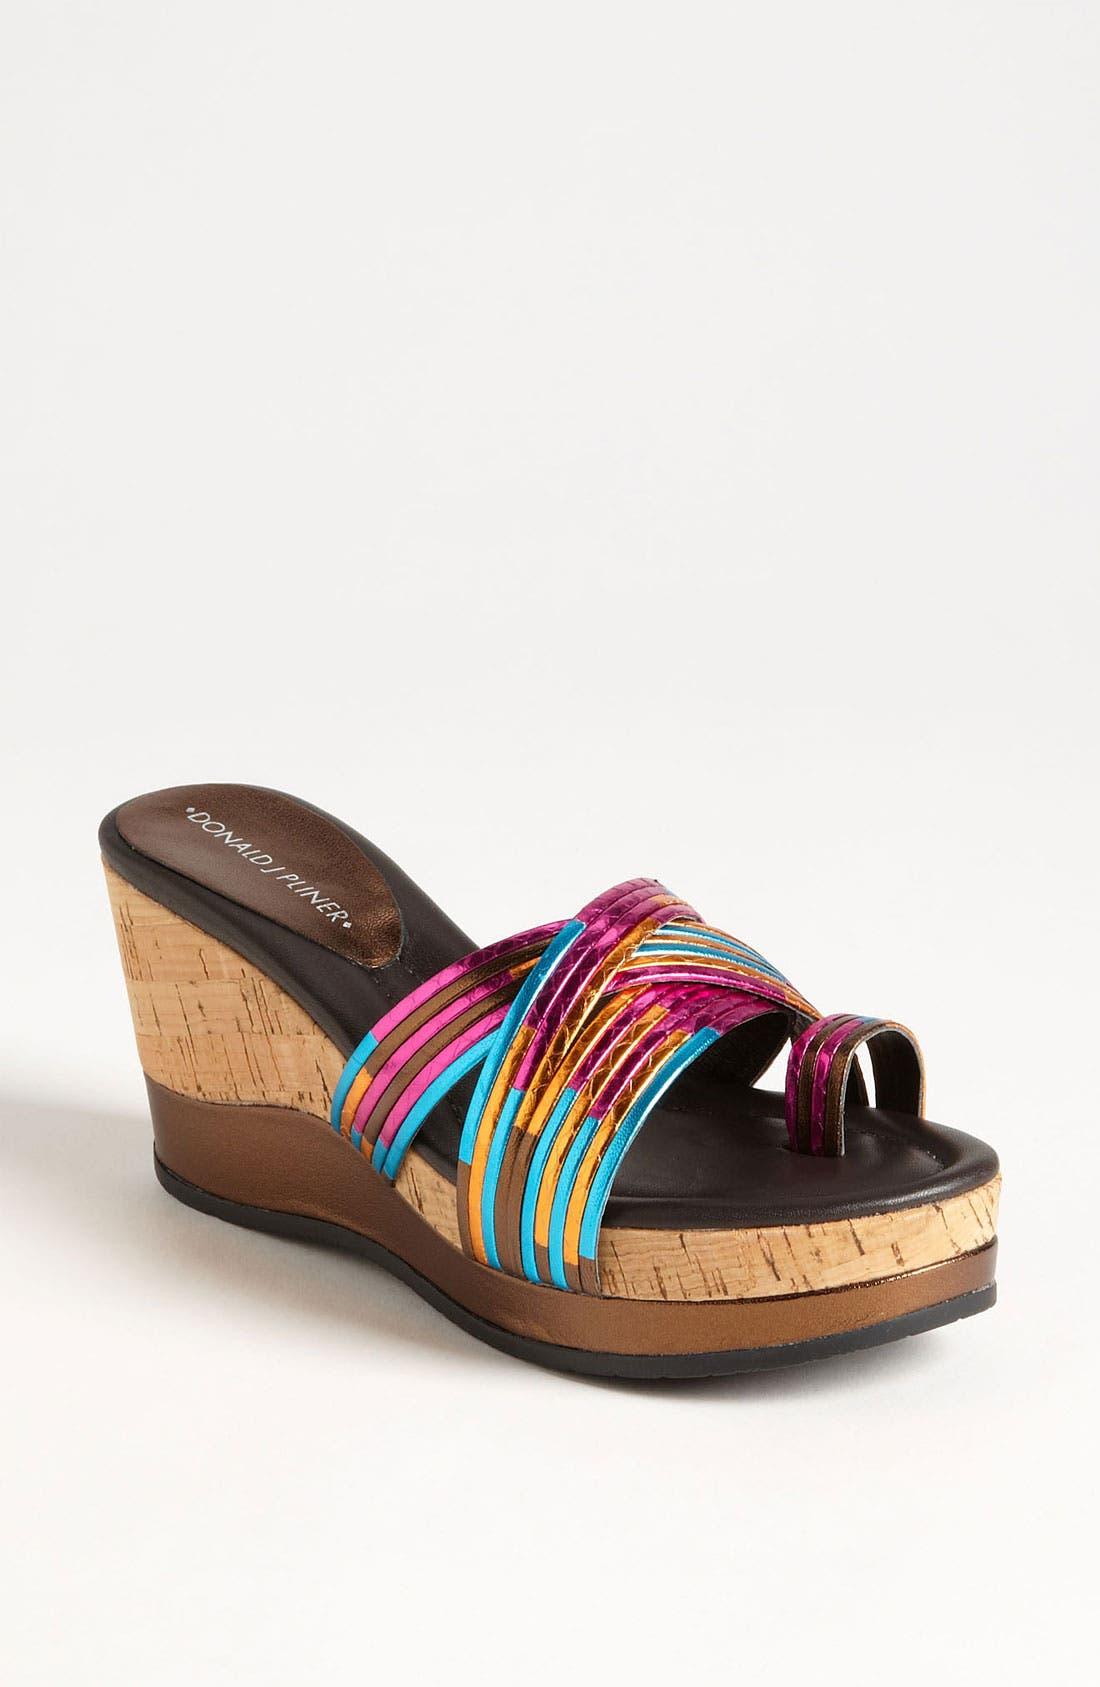 Main Image - Donald J Pliner 'Lettie' Sandal